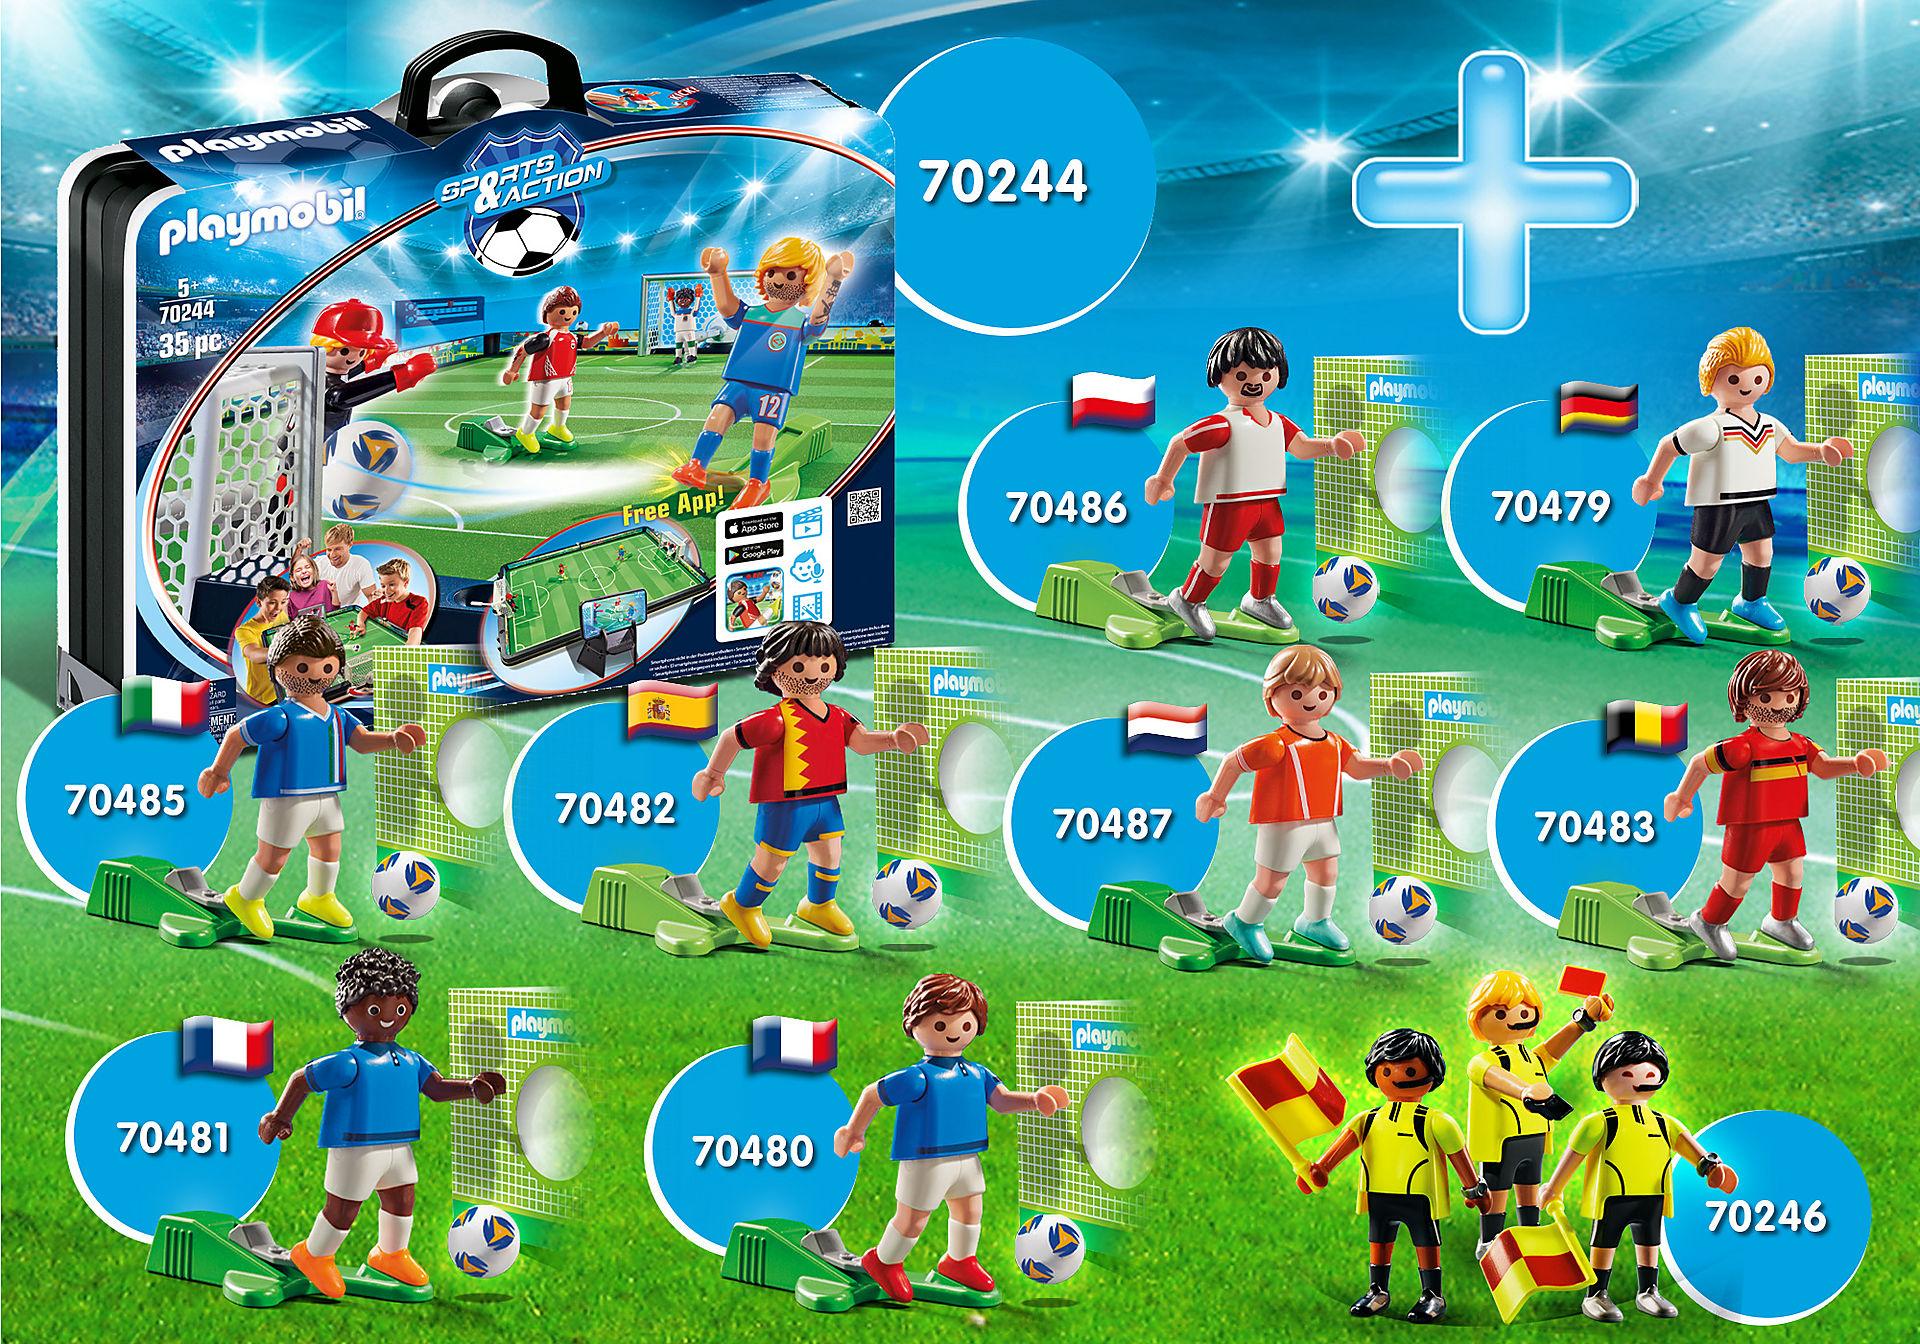 PM2106C Bundle soccer zoom image1